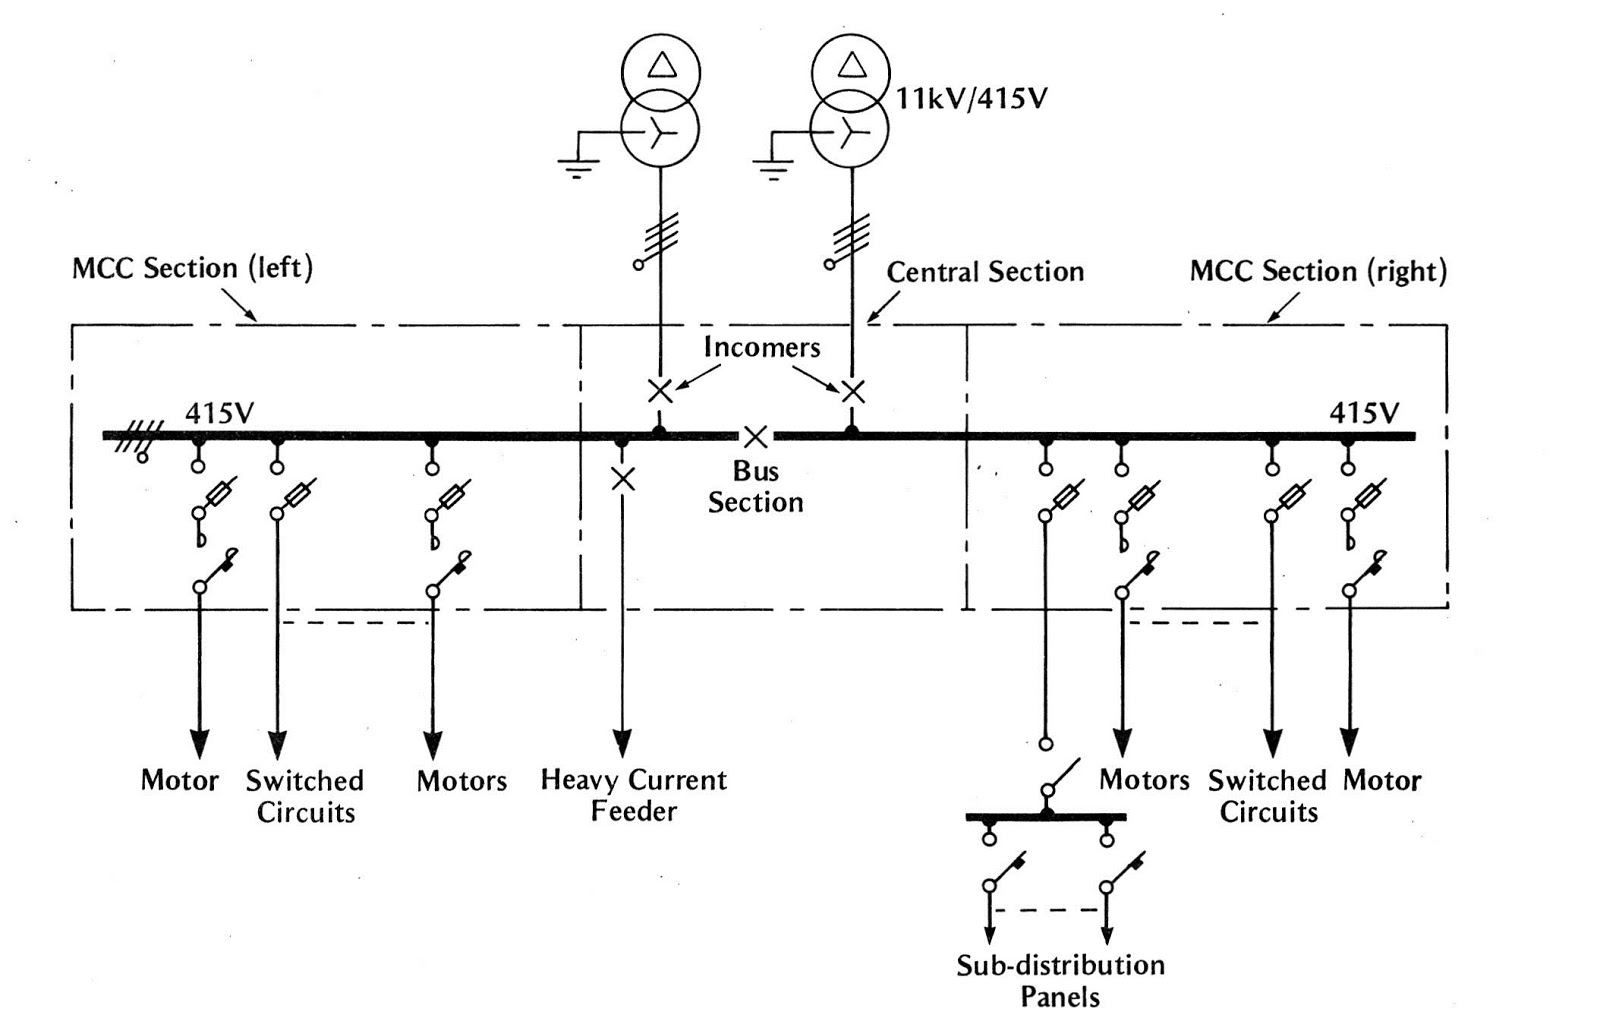 medium resolution of low voltage wiring diagram symbols chapter 3 low voltage switchgear lekule blog design